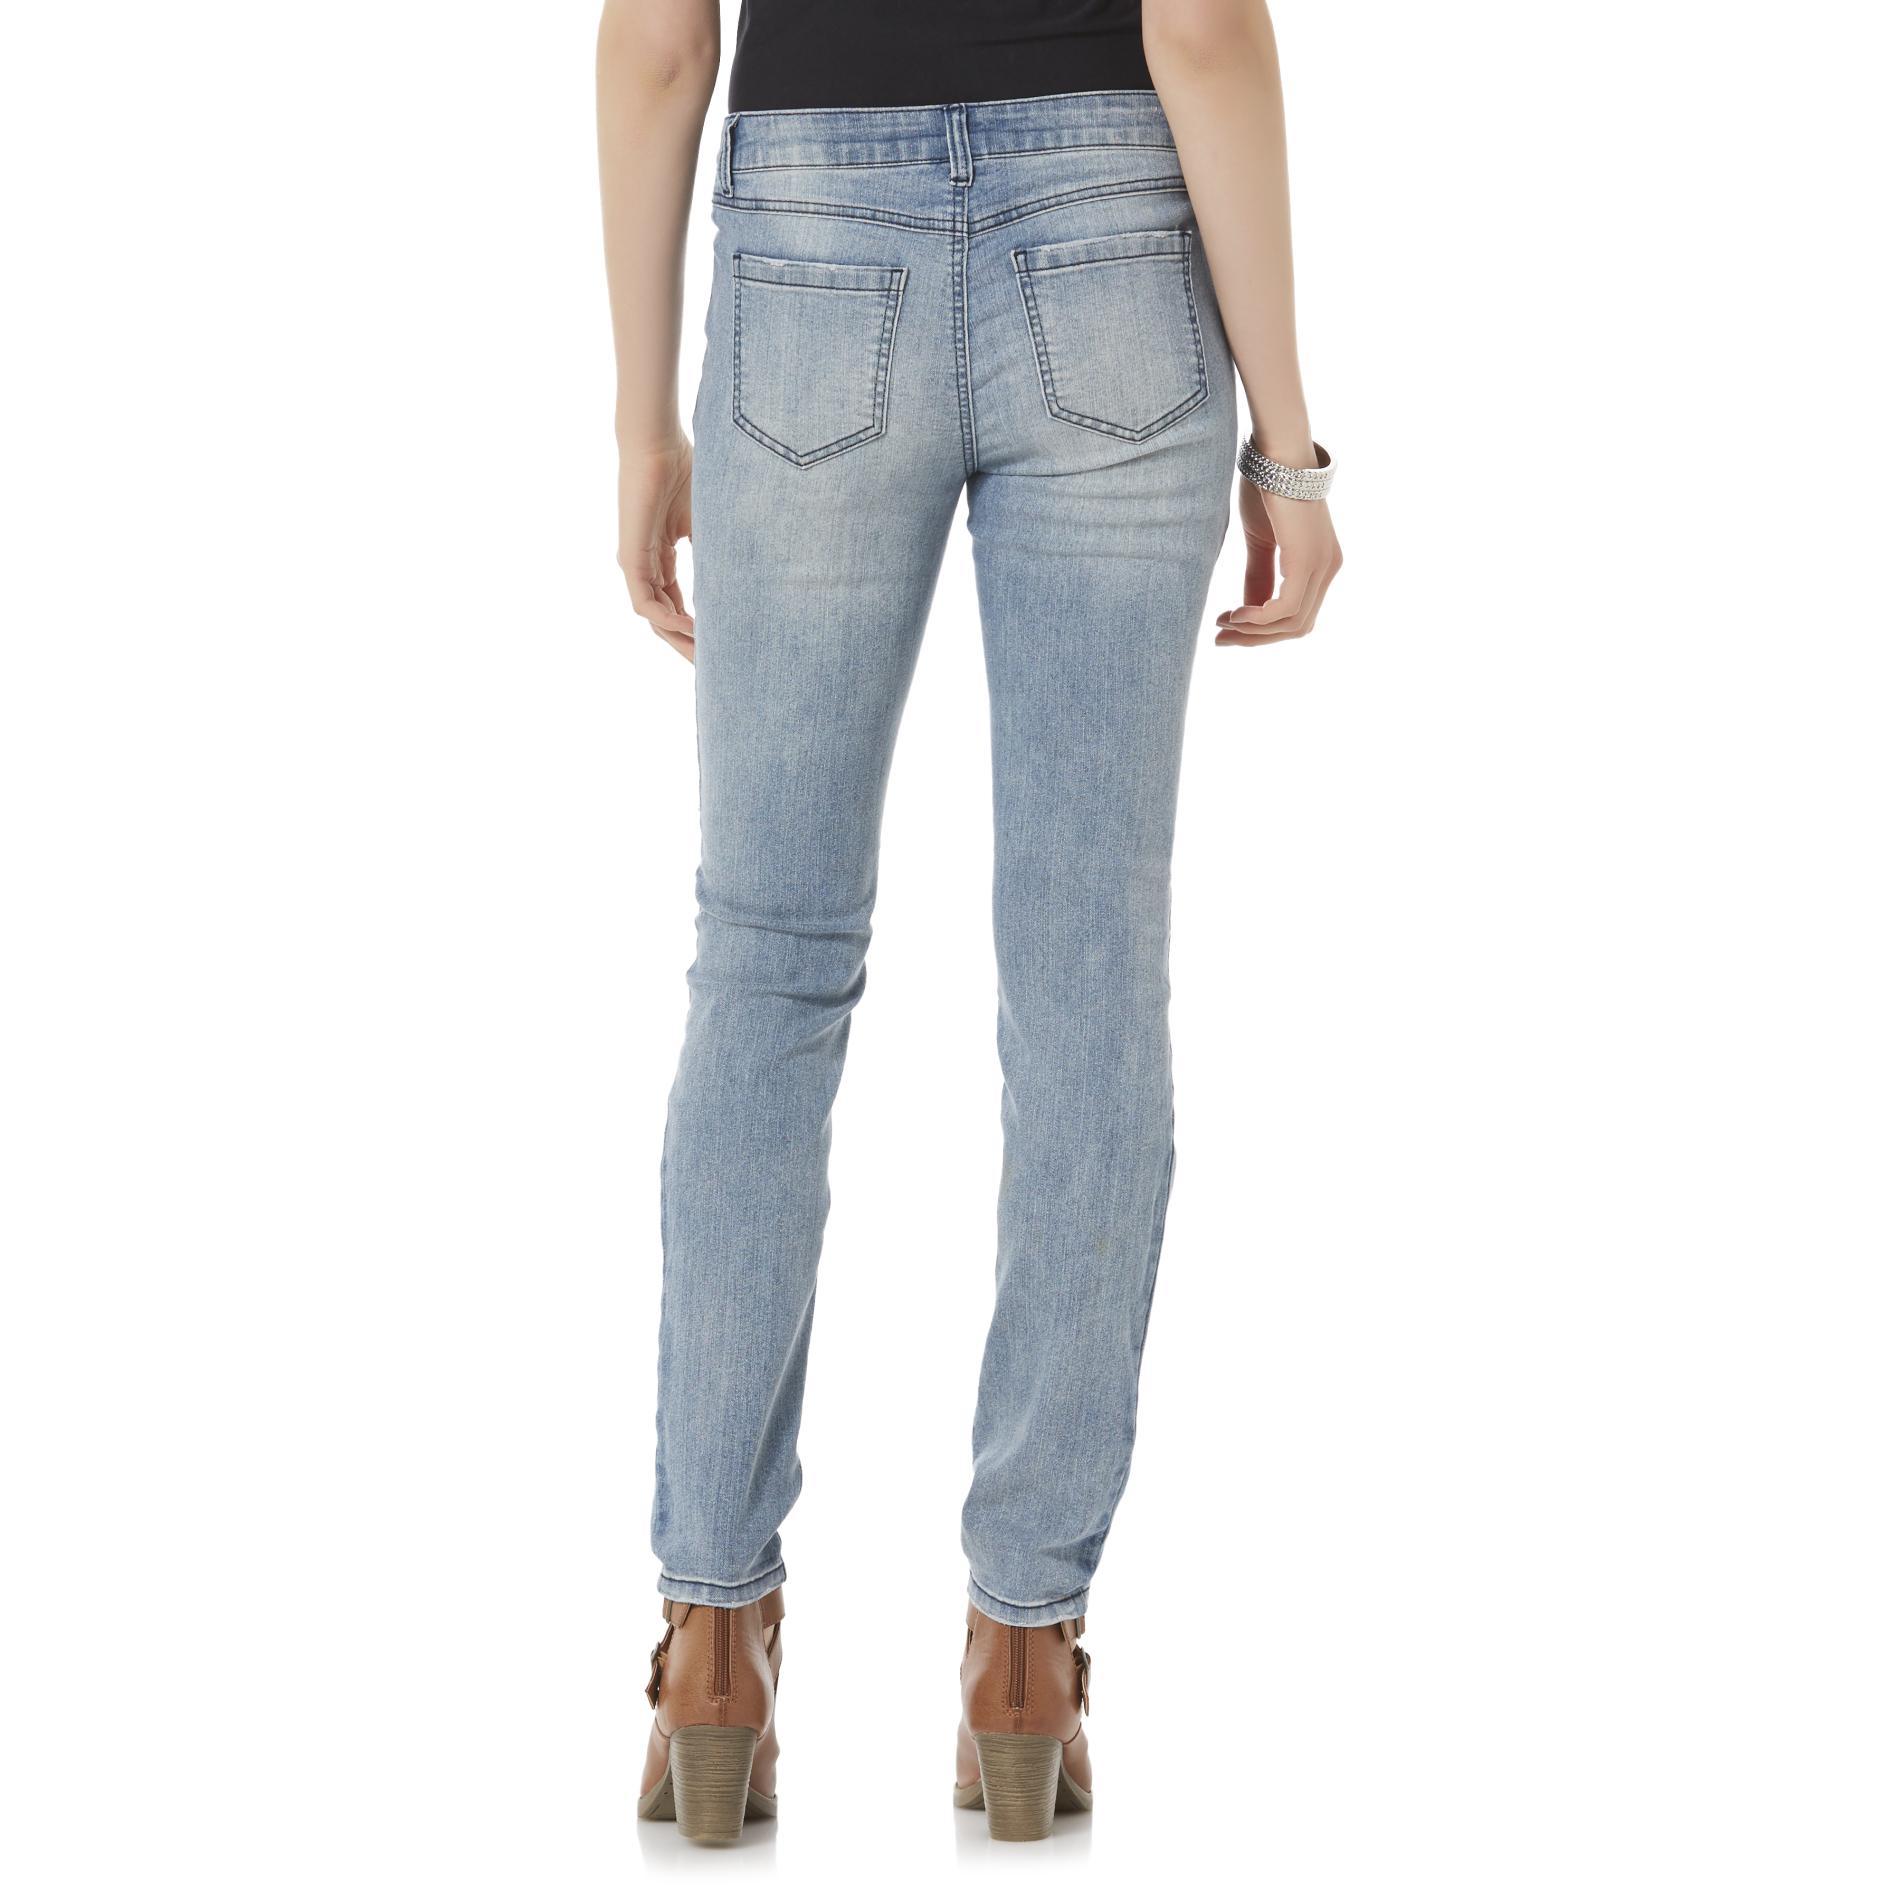 Rewash Junior's Vintage Reunion Deconstructed Skinny Jeans